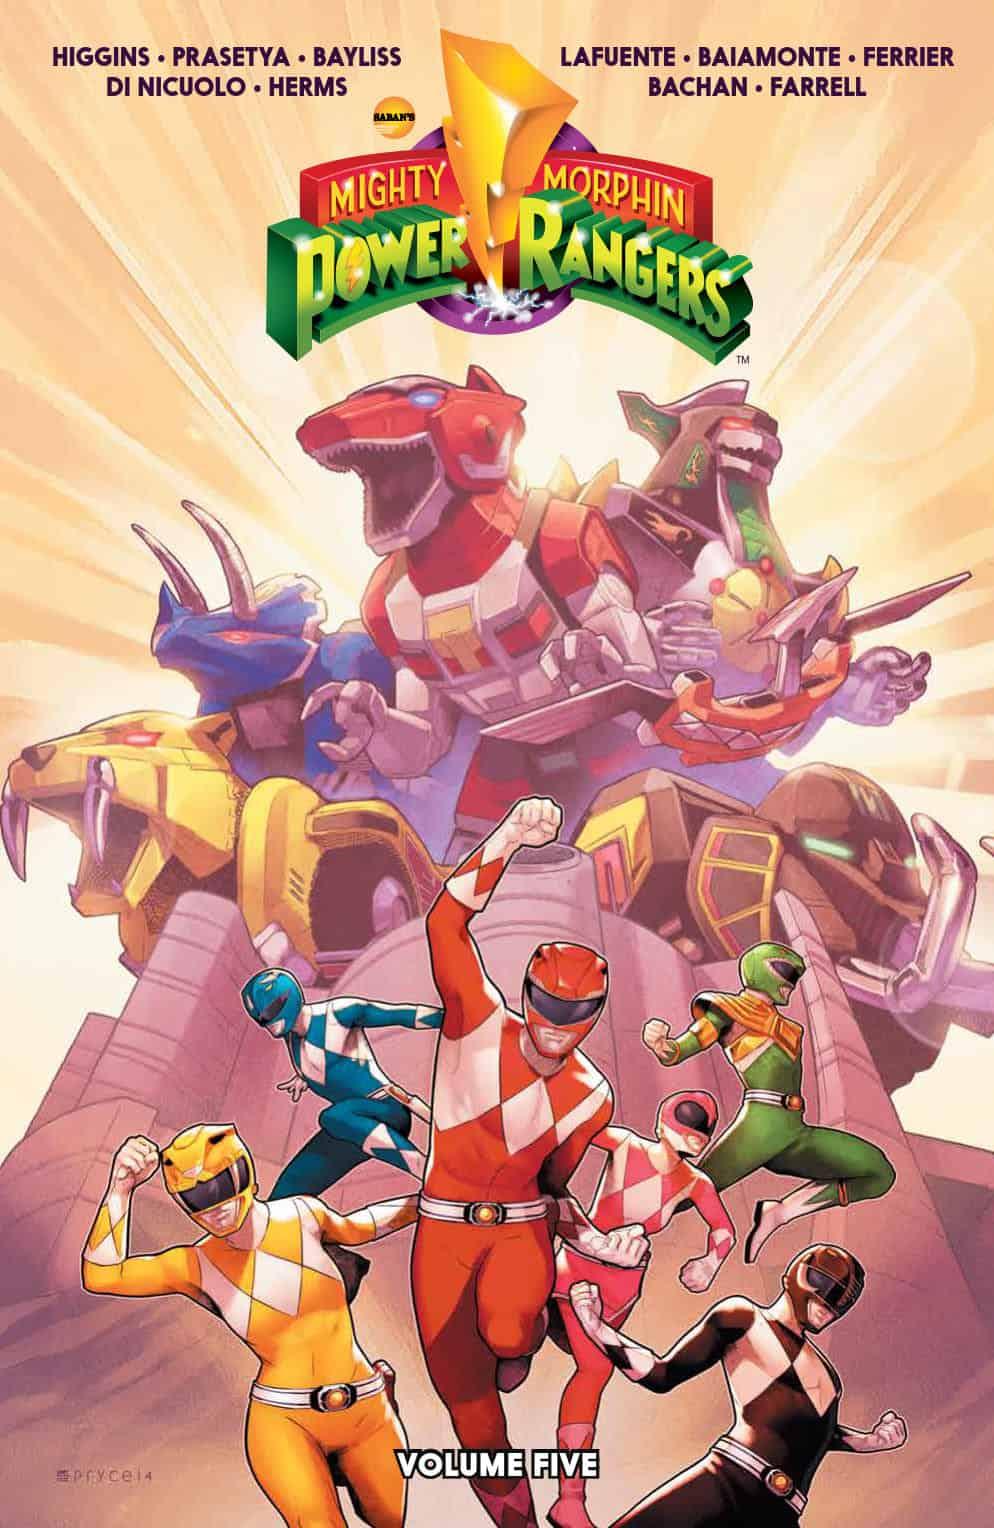 Mighty Morphin Power Rangers Vol. 5 SC